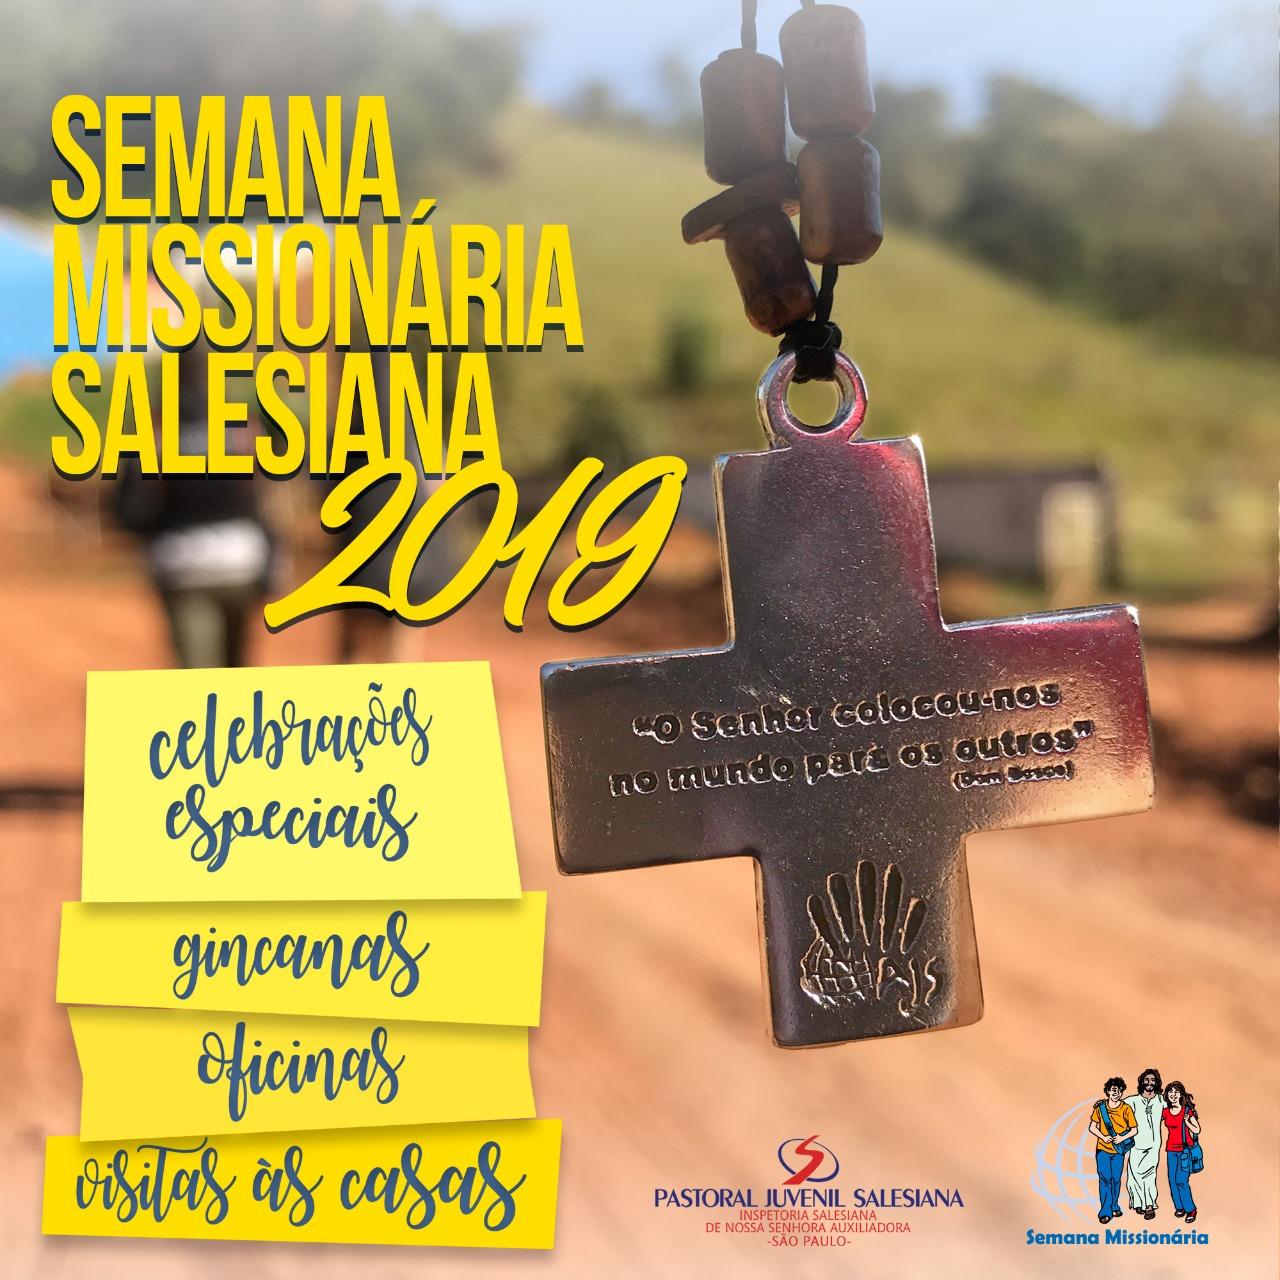 Semana Missionária Salesiana 2019